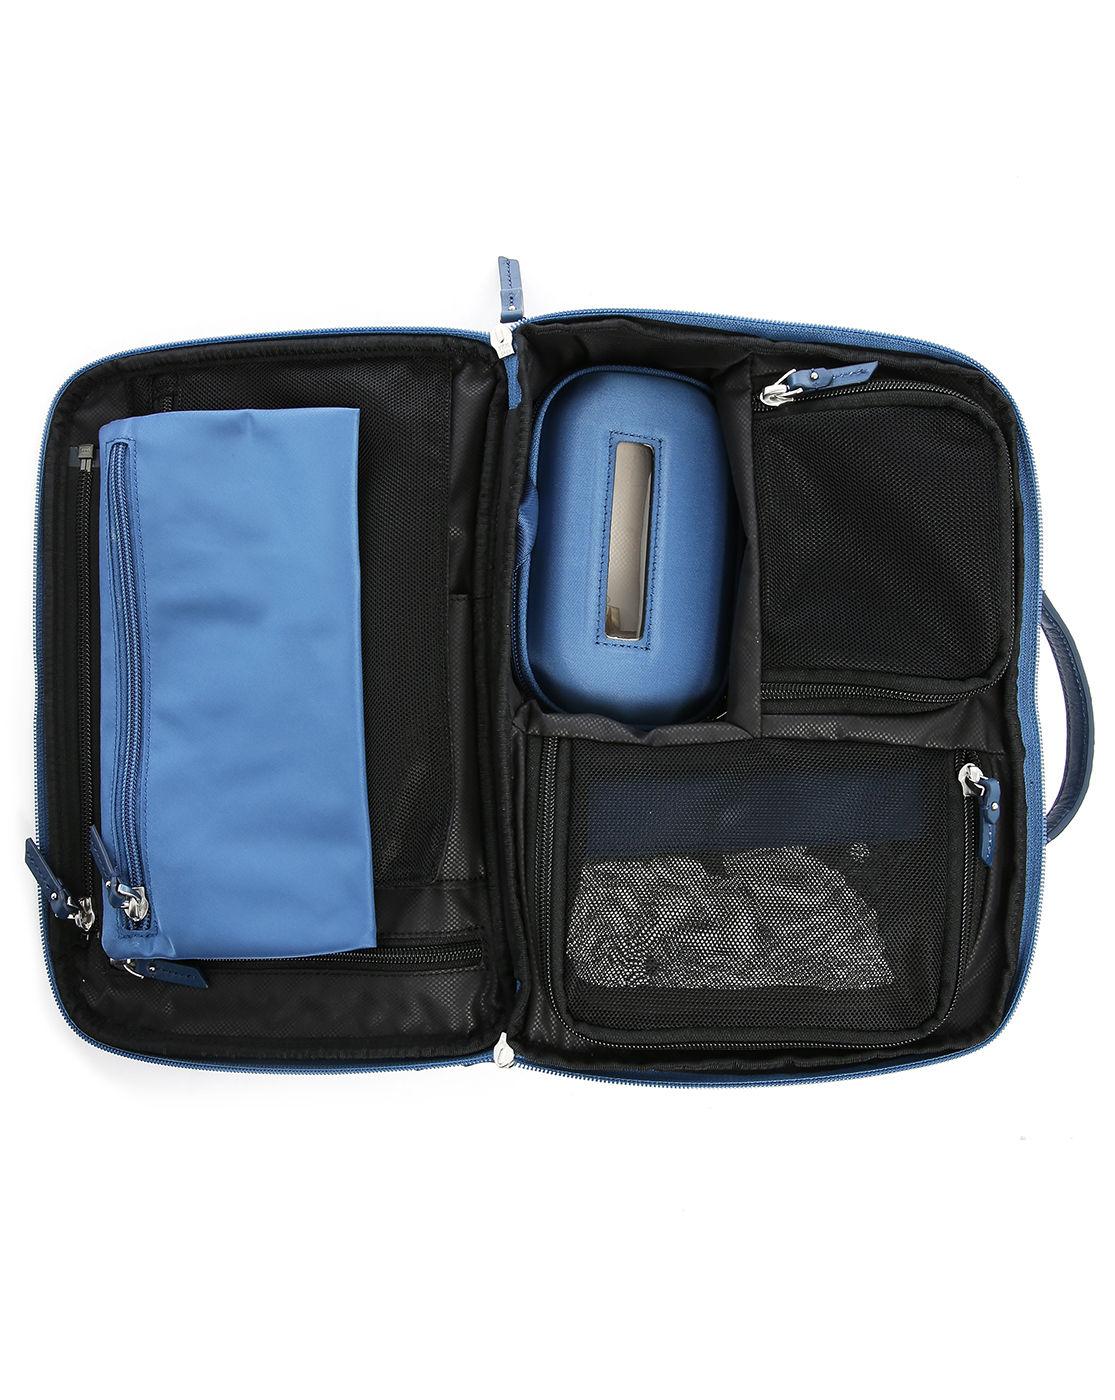 Tumi Travel Cosmetic Case